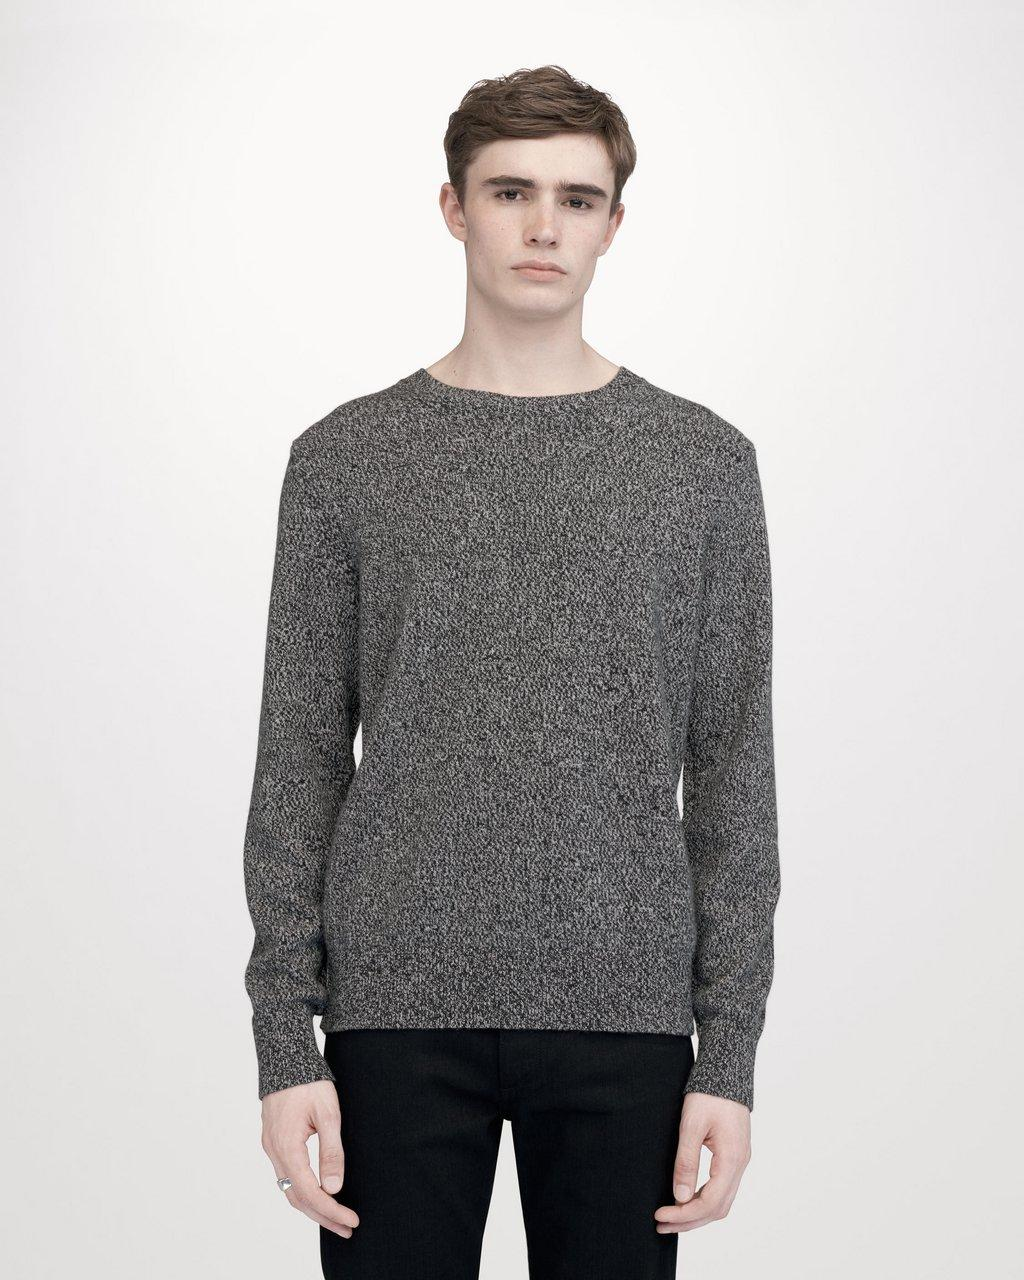 Haldon Cashmere Crew | Apparel Sweaters | rag & bone